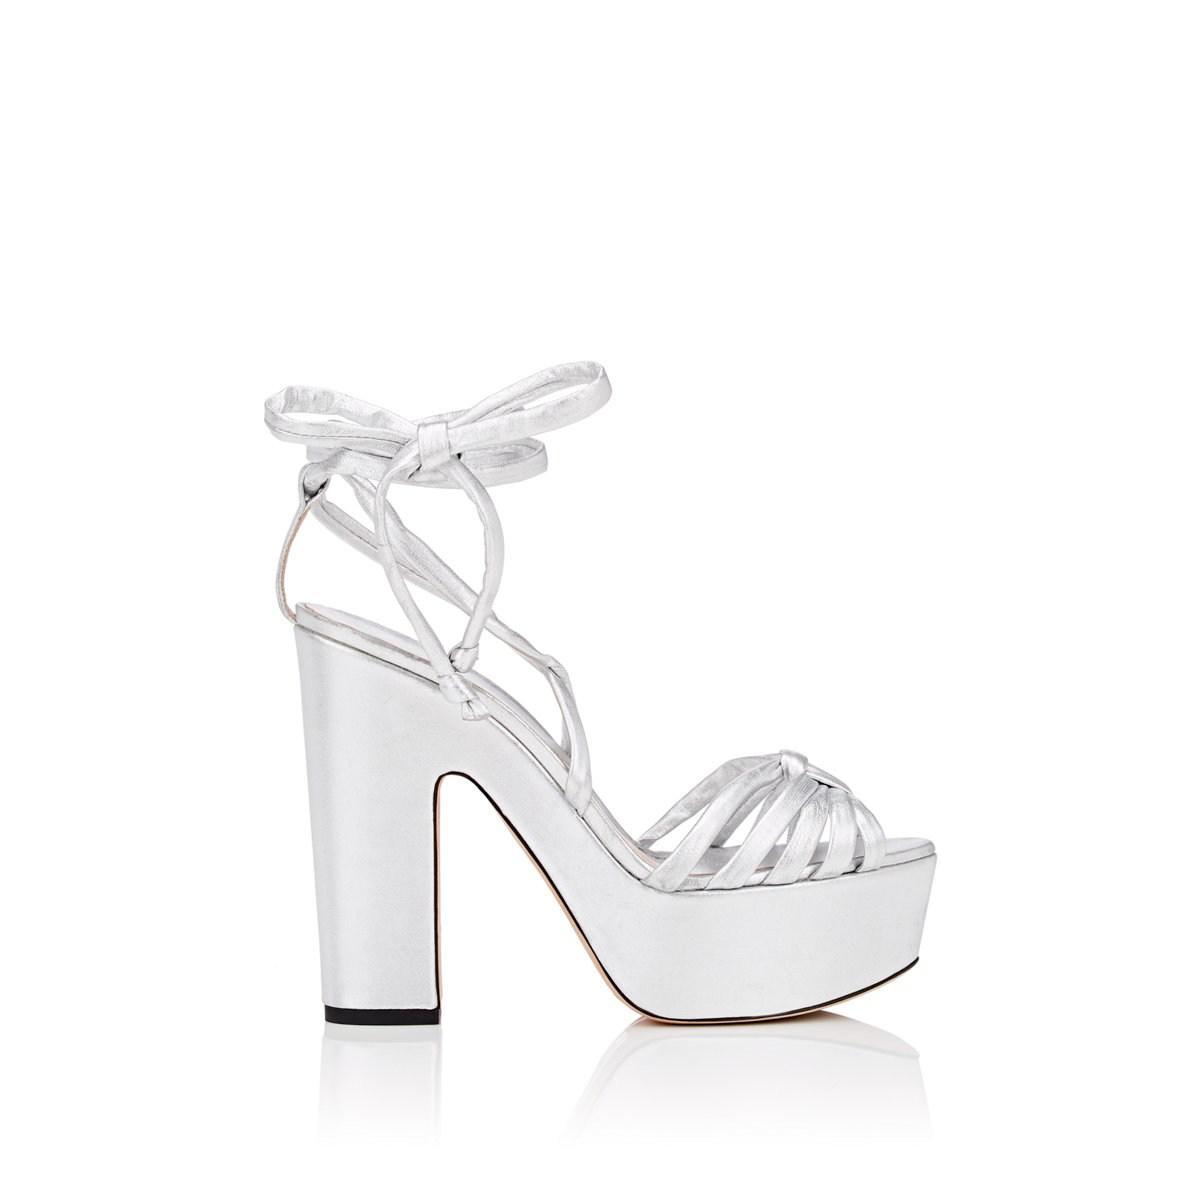 708bb807ec3 Alchimia Di Ballin. Women s Metallic Tara Leather Ankle-wrap Platform  Sandals